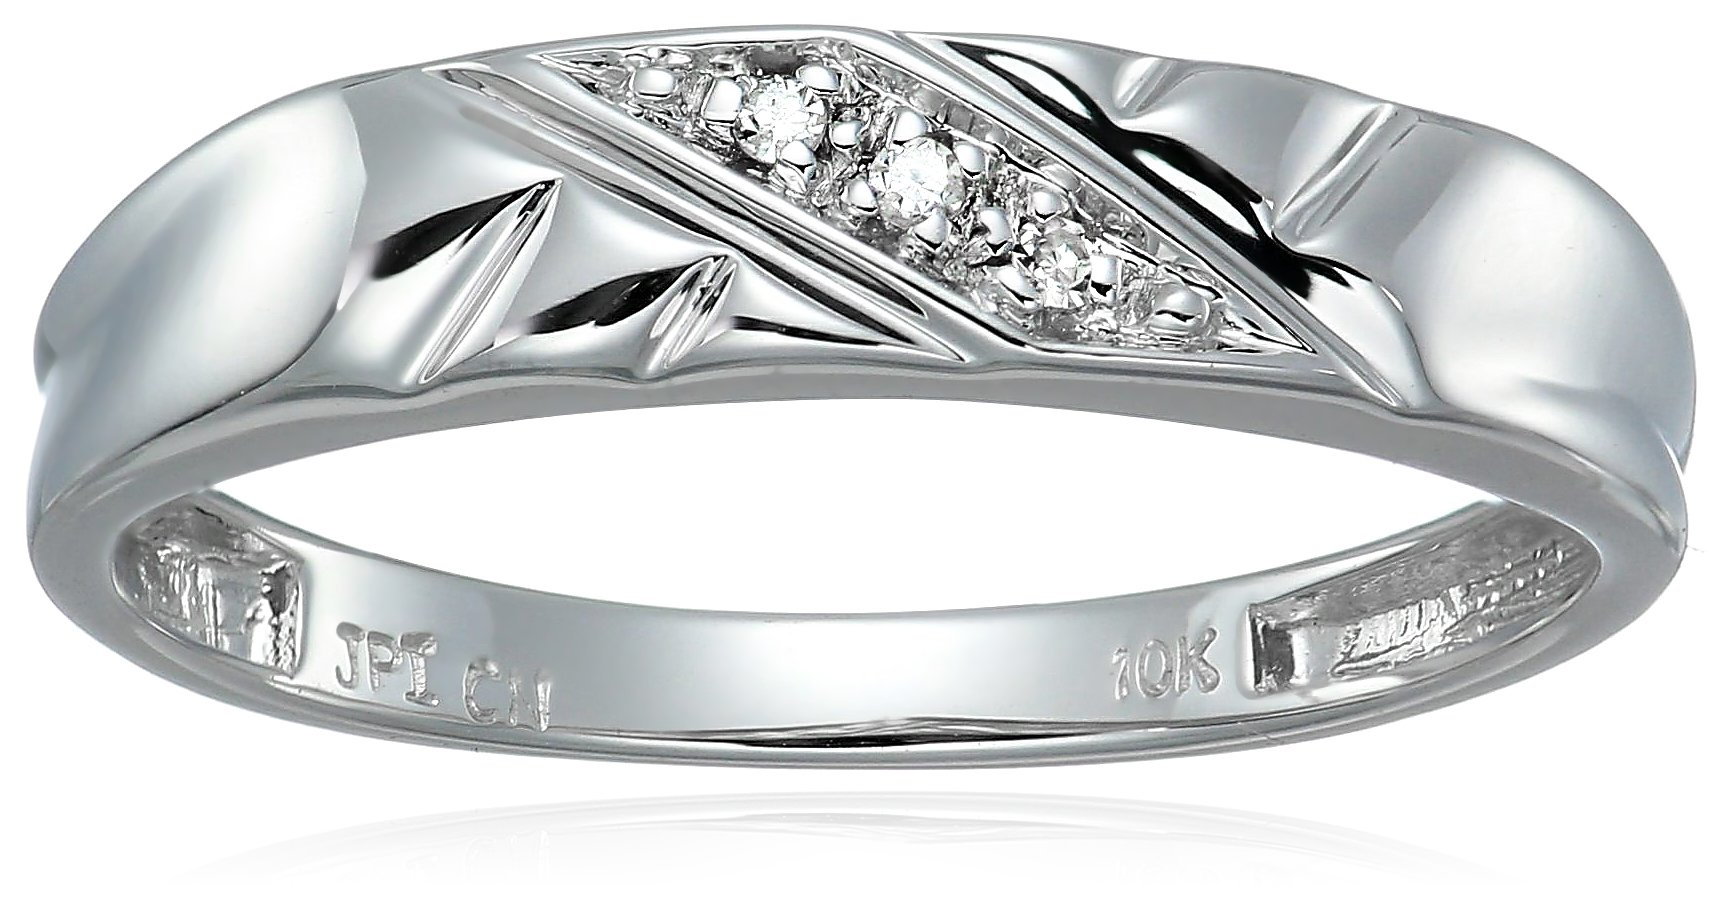 Women's 10k White Gold Diamond-Accent Diamond Wedding Band